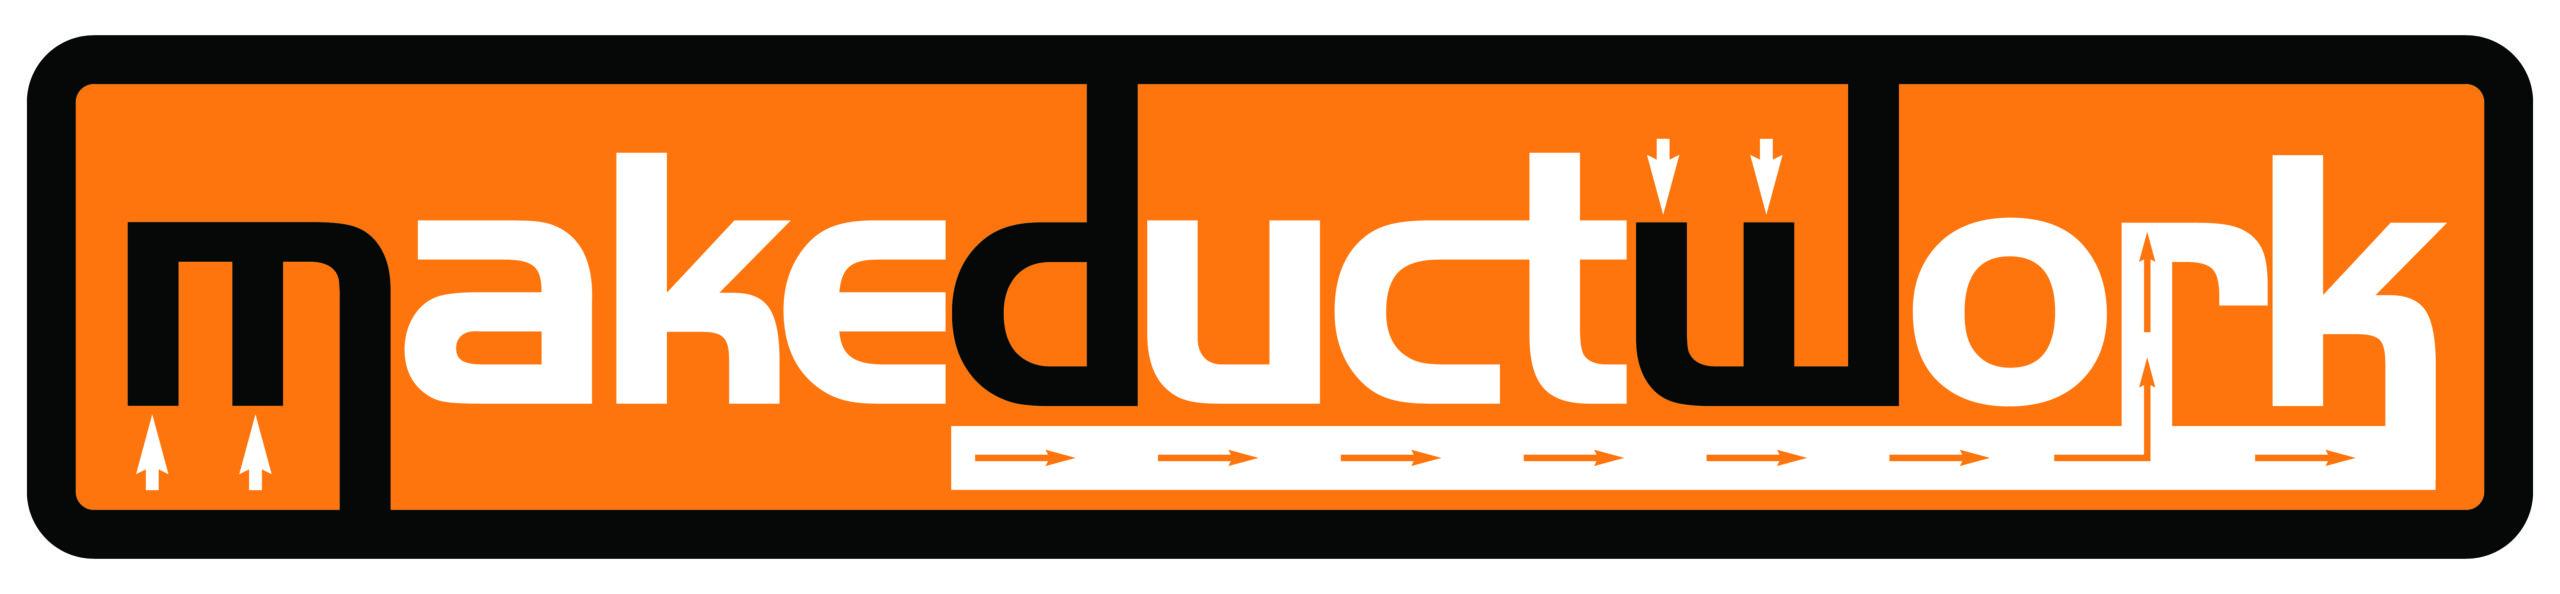 Make Duct Work